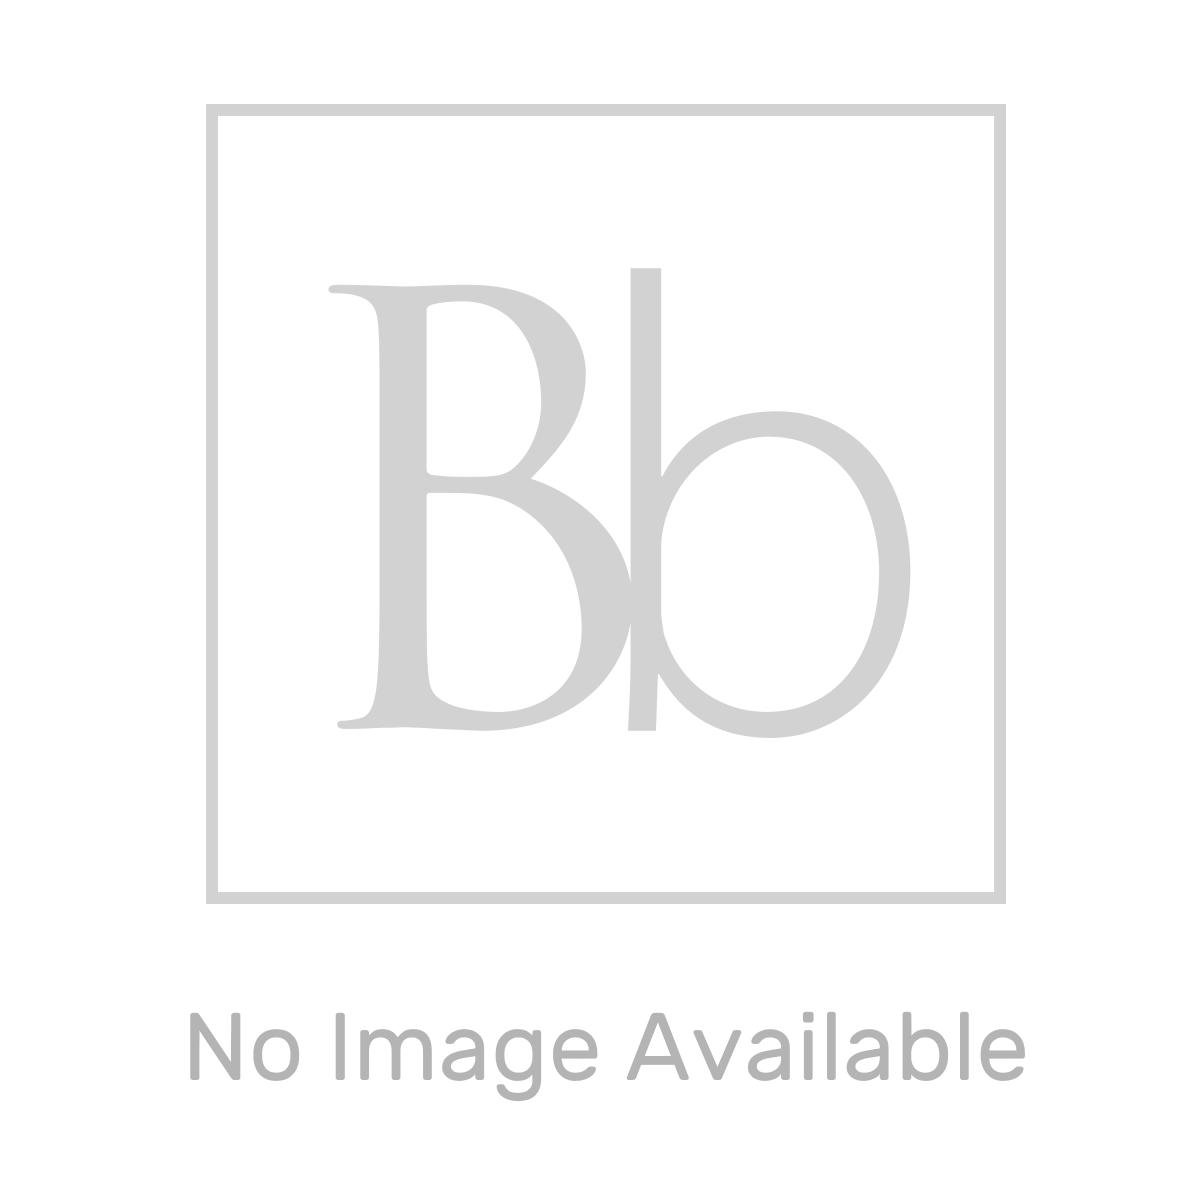 Aquadart Rolla 8 Black Sliding Shower Enclosure with Corner Post Configuration